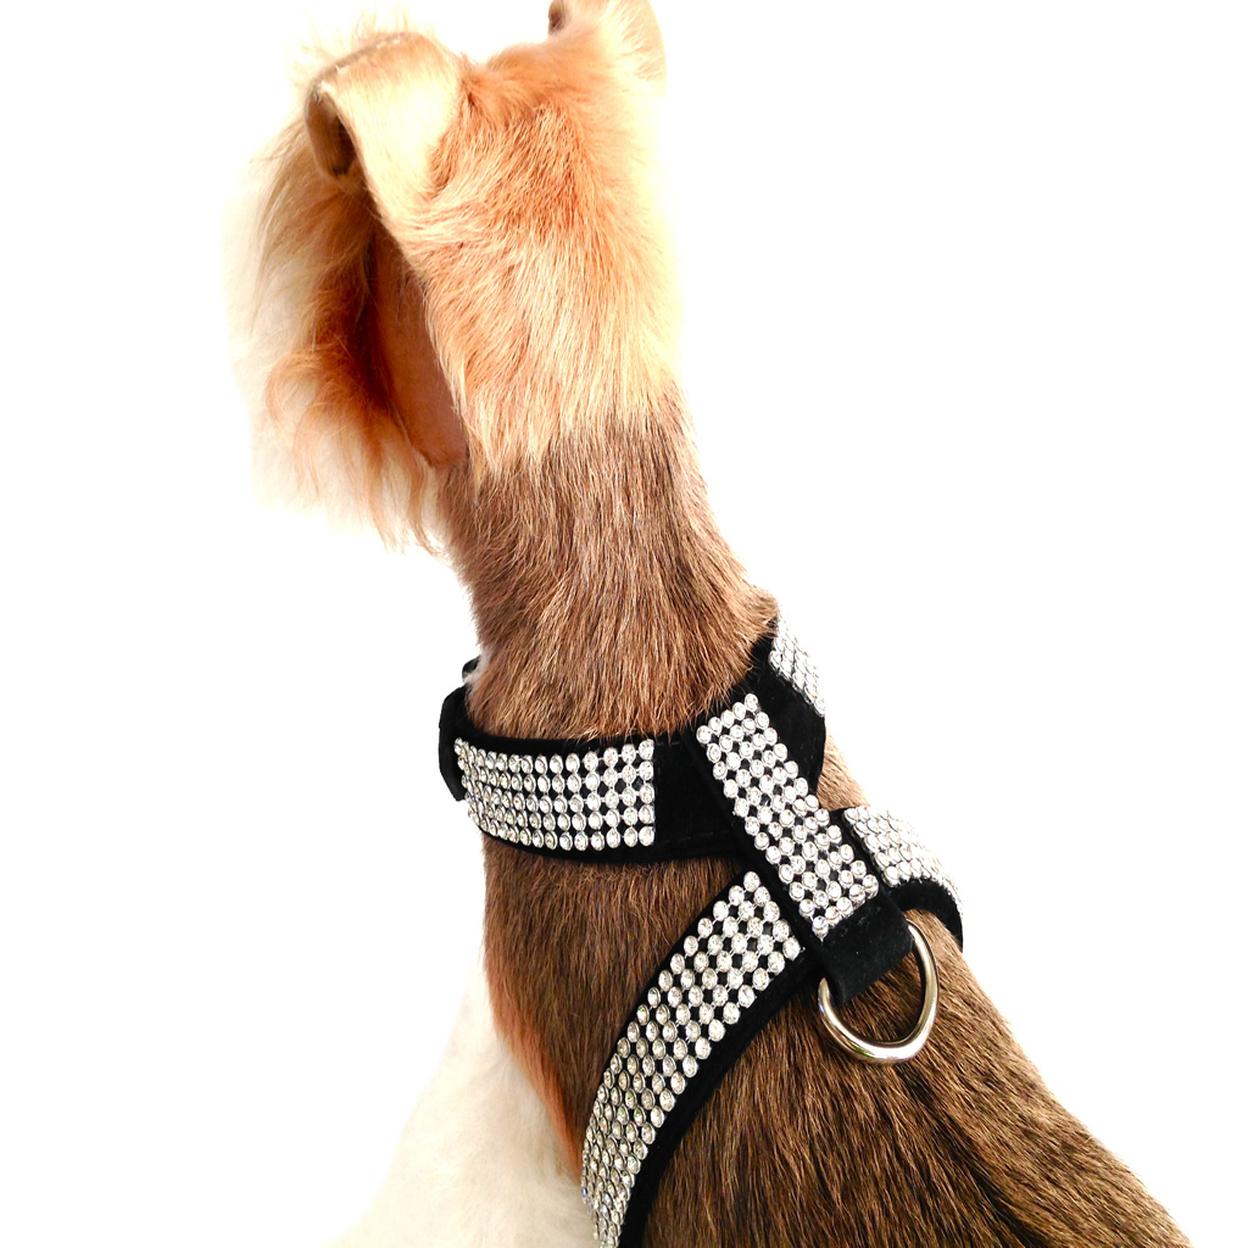 Velvet Crystal Dog Harness *sale* - Black, XS 5712c47a4f3d6f42658b4a9d